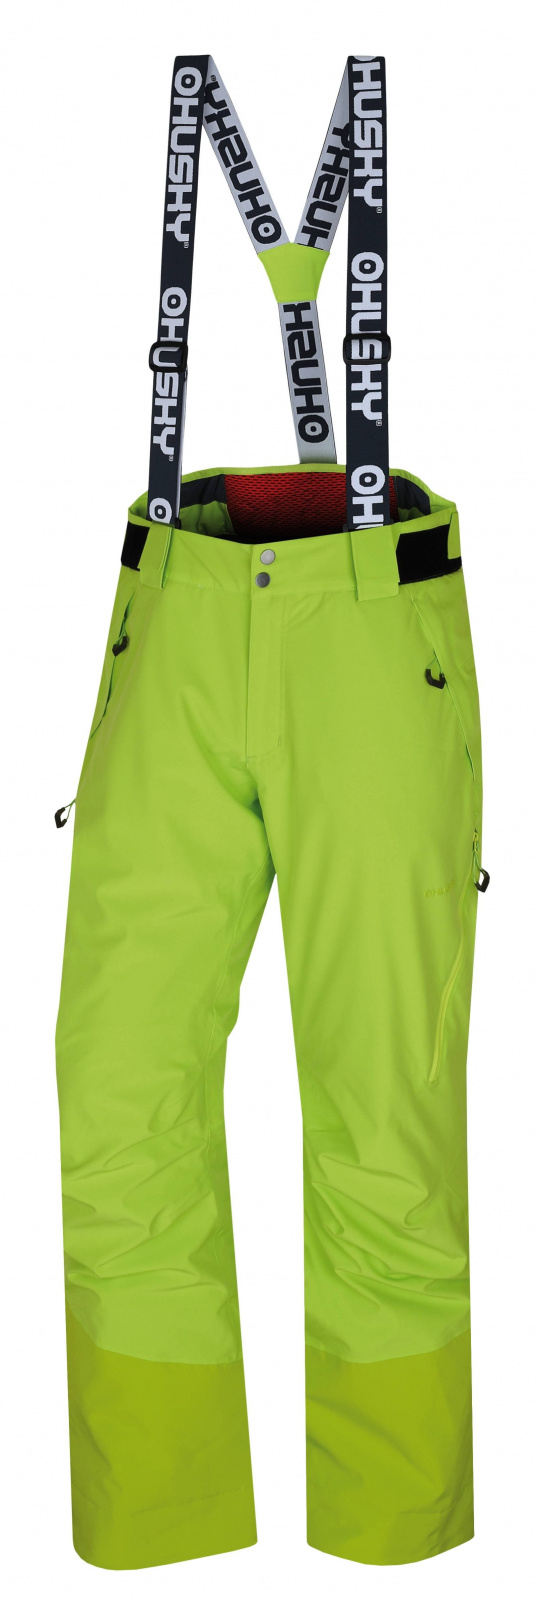 Husky Mitaly M výrazne zelená, XXL Pánske lyžiarske nohavice